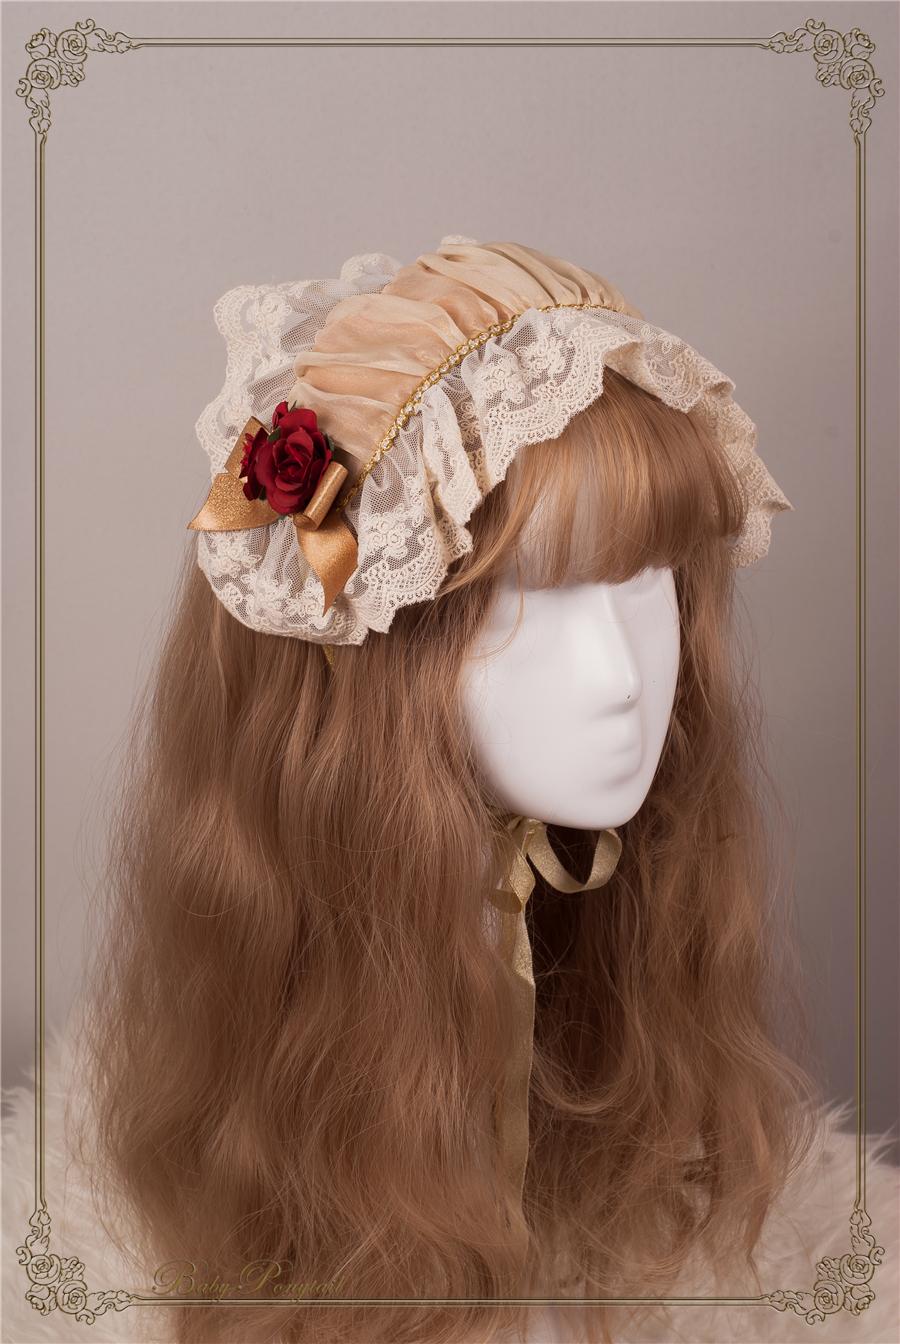 BabyPonytail_Rose Battle_Stock Photo_Petite Rose Head Dress Amber_5.jpg